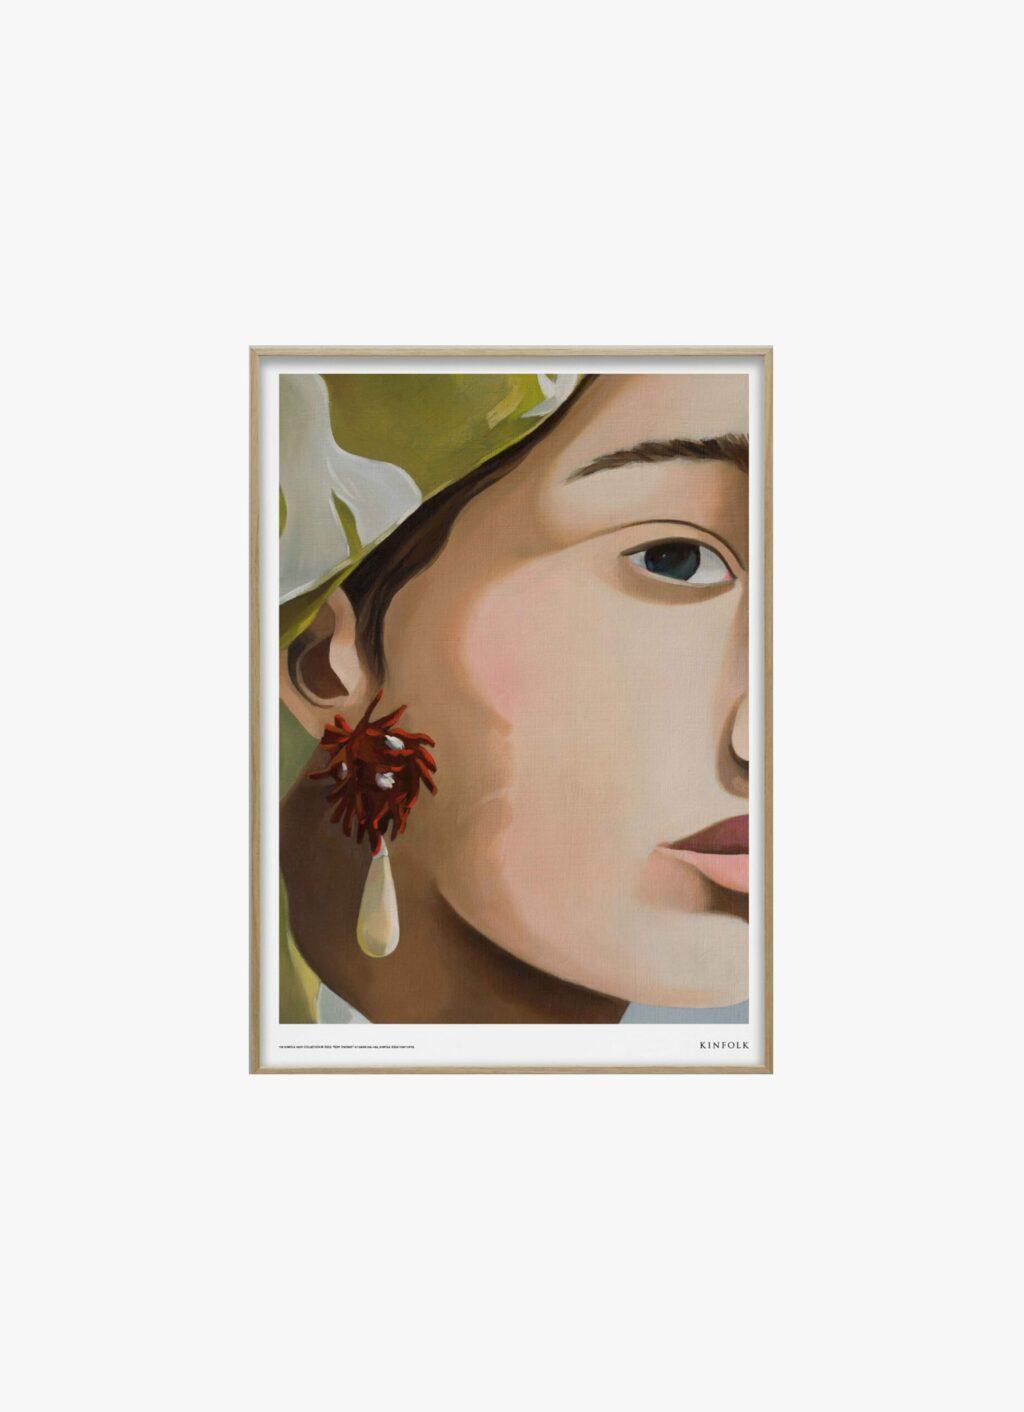 Alium - Kinfolk Print Collection - Diana Dal-Pra - Soft Strokes 01 - 50x70cm